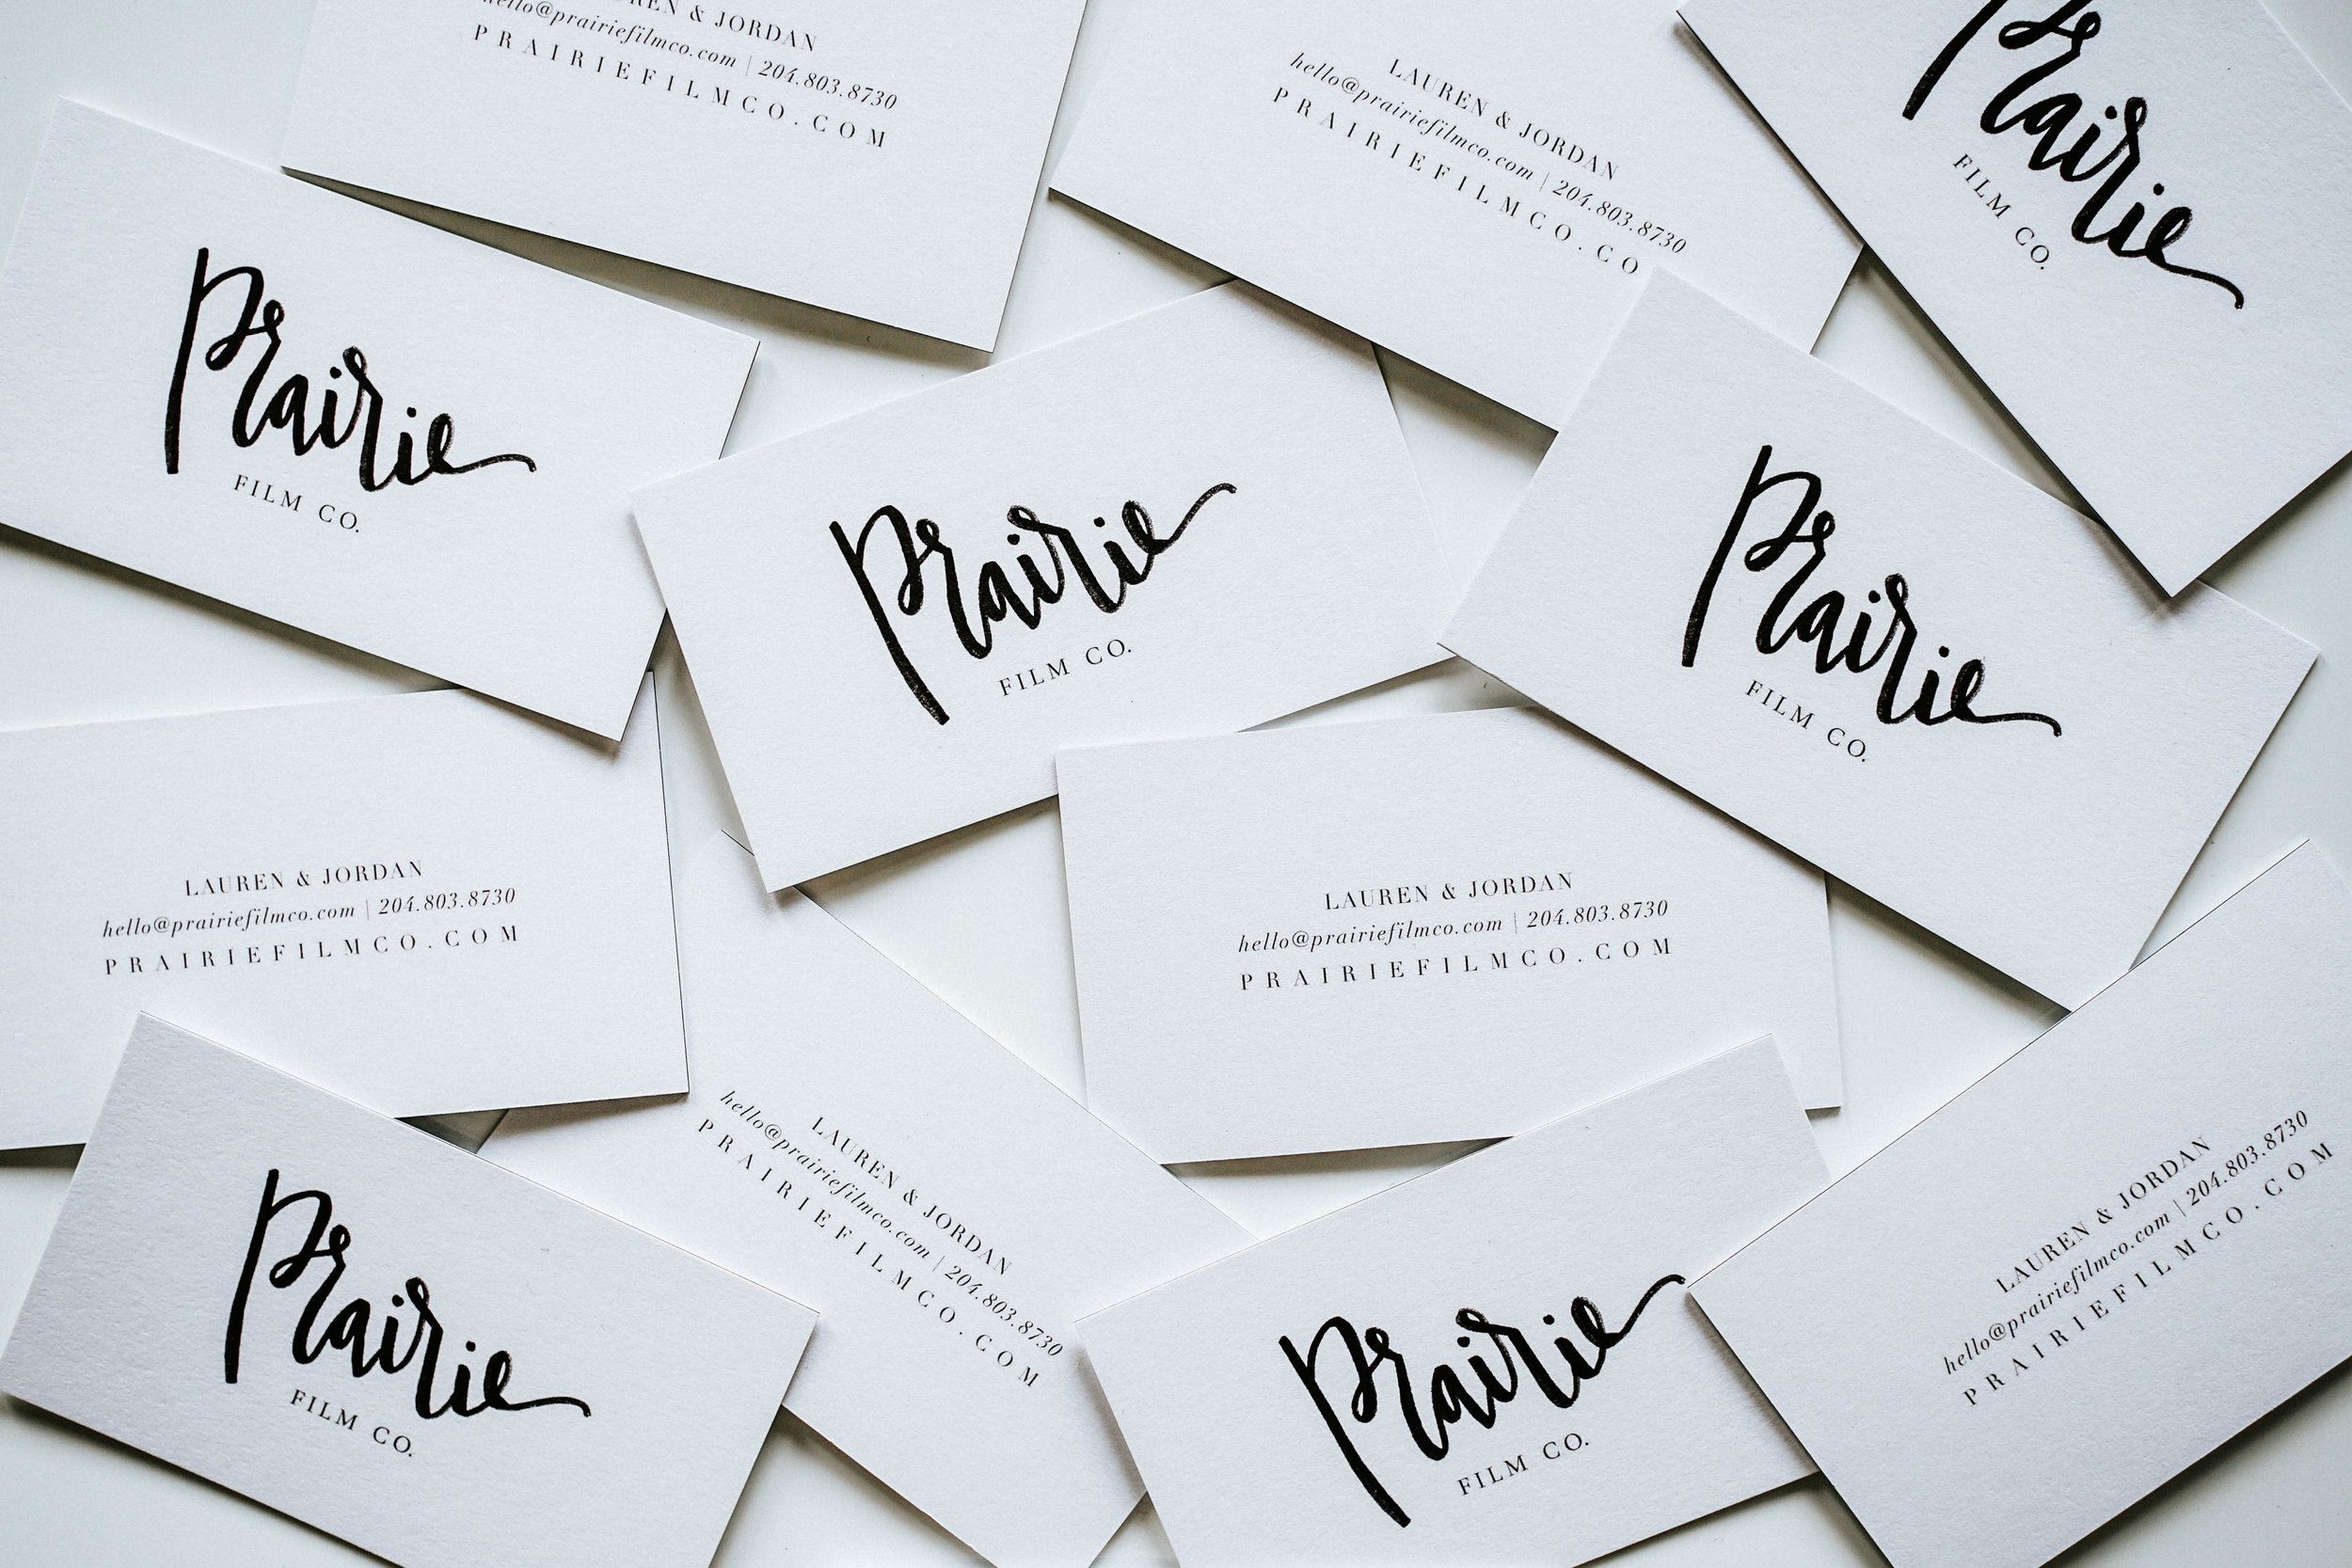 Prairie Film Co Business Cards.jpg